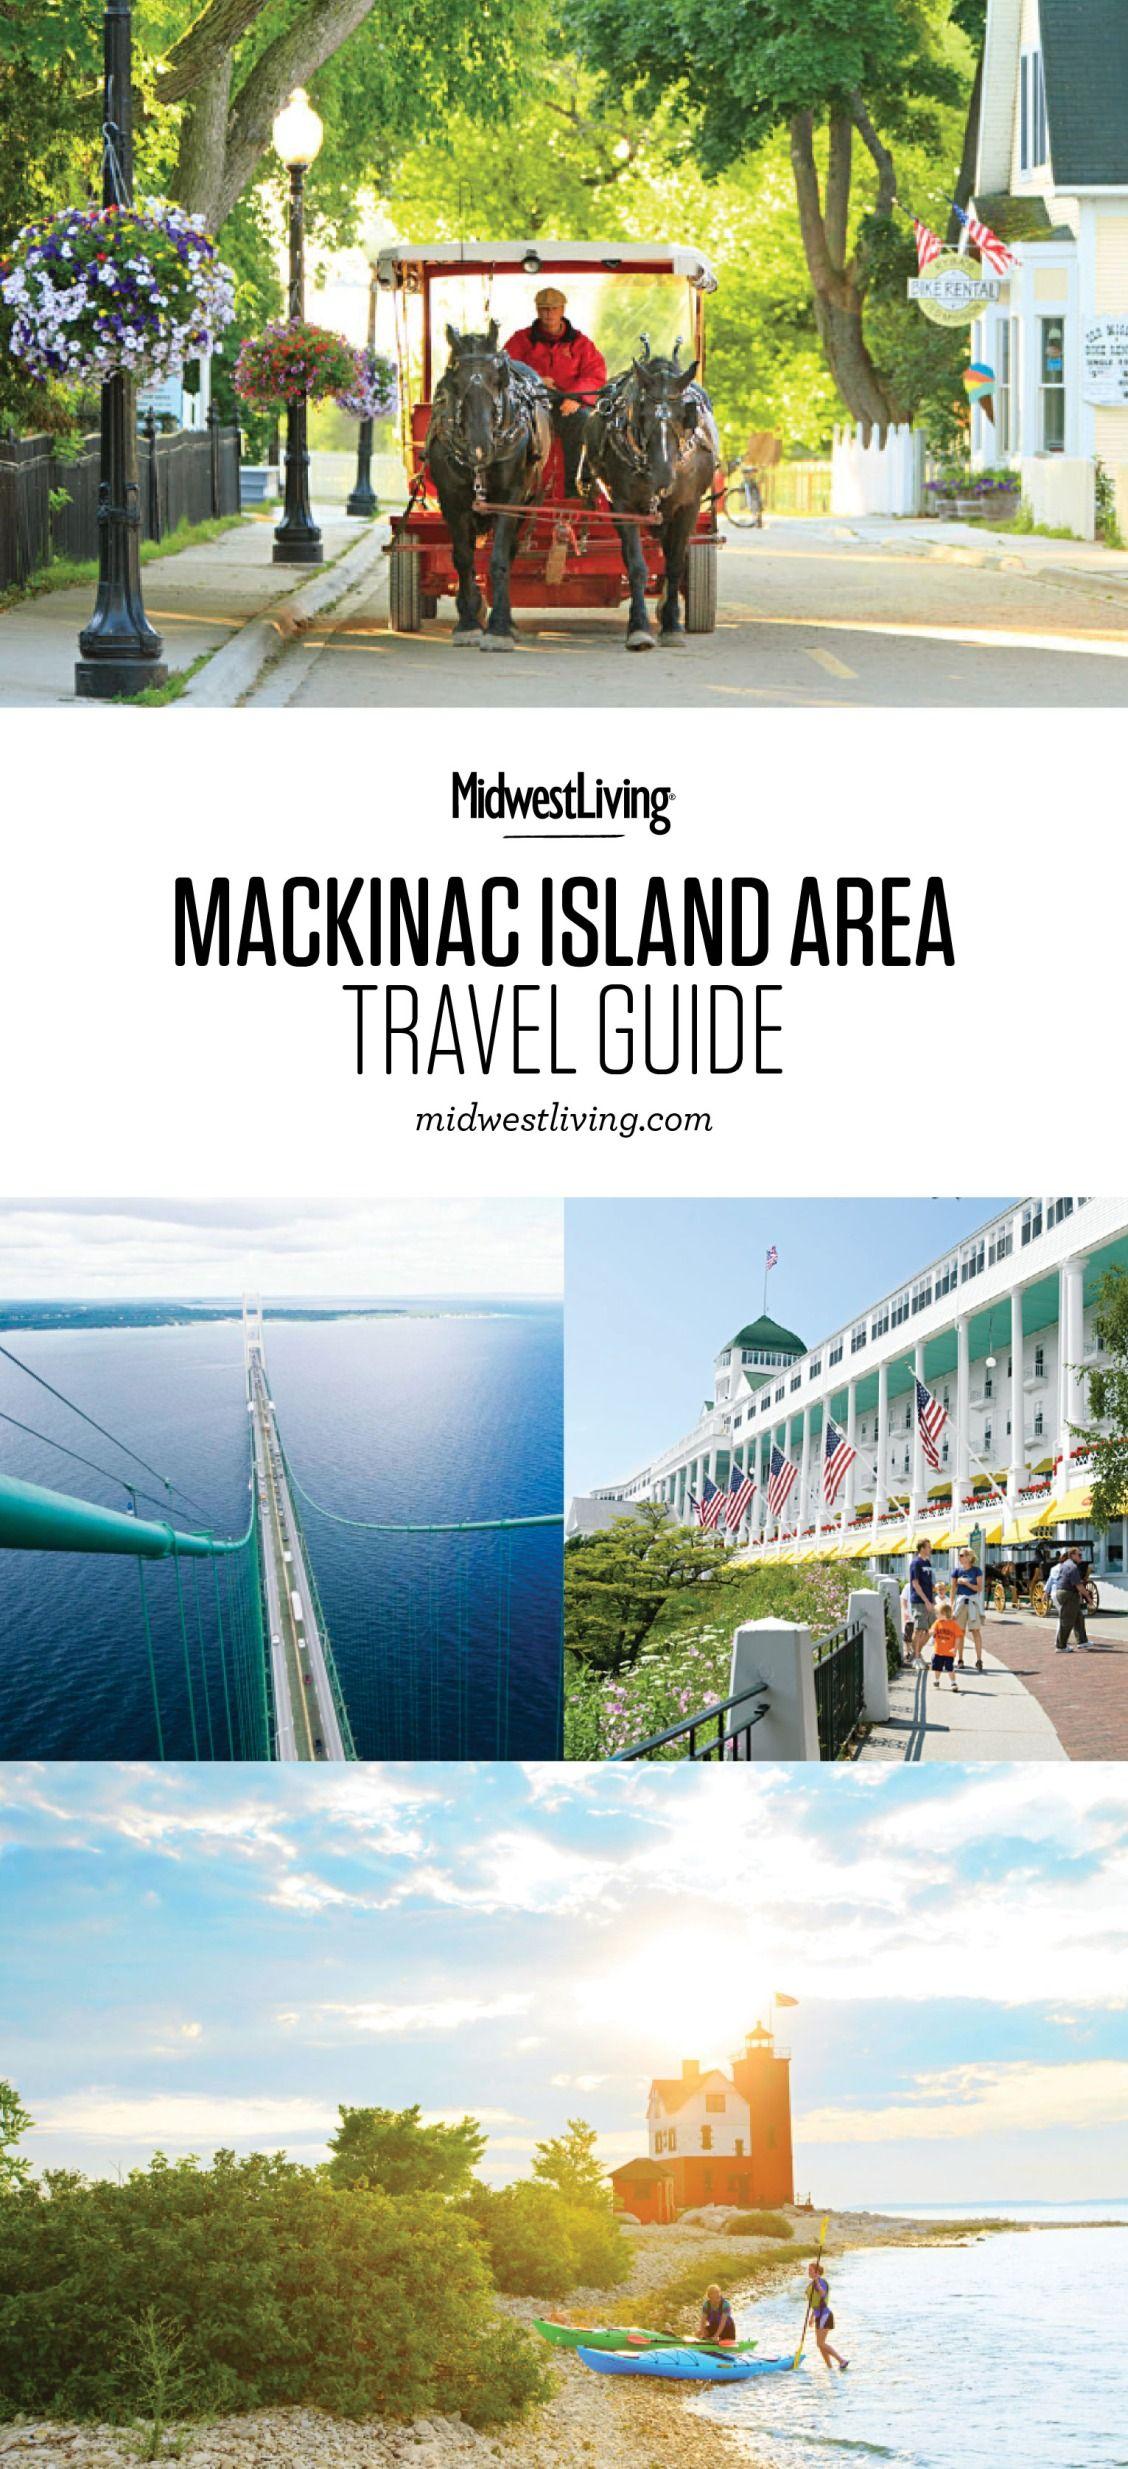 Top Things To Do In The Mackinac Island Area Michigan Michigan Road Trip Michigan Travel Mackinac Island